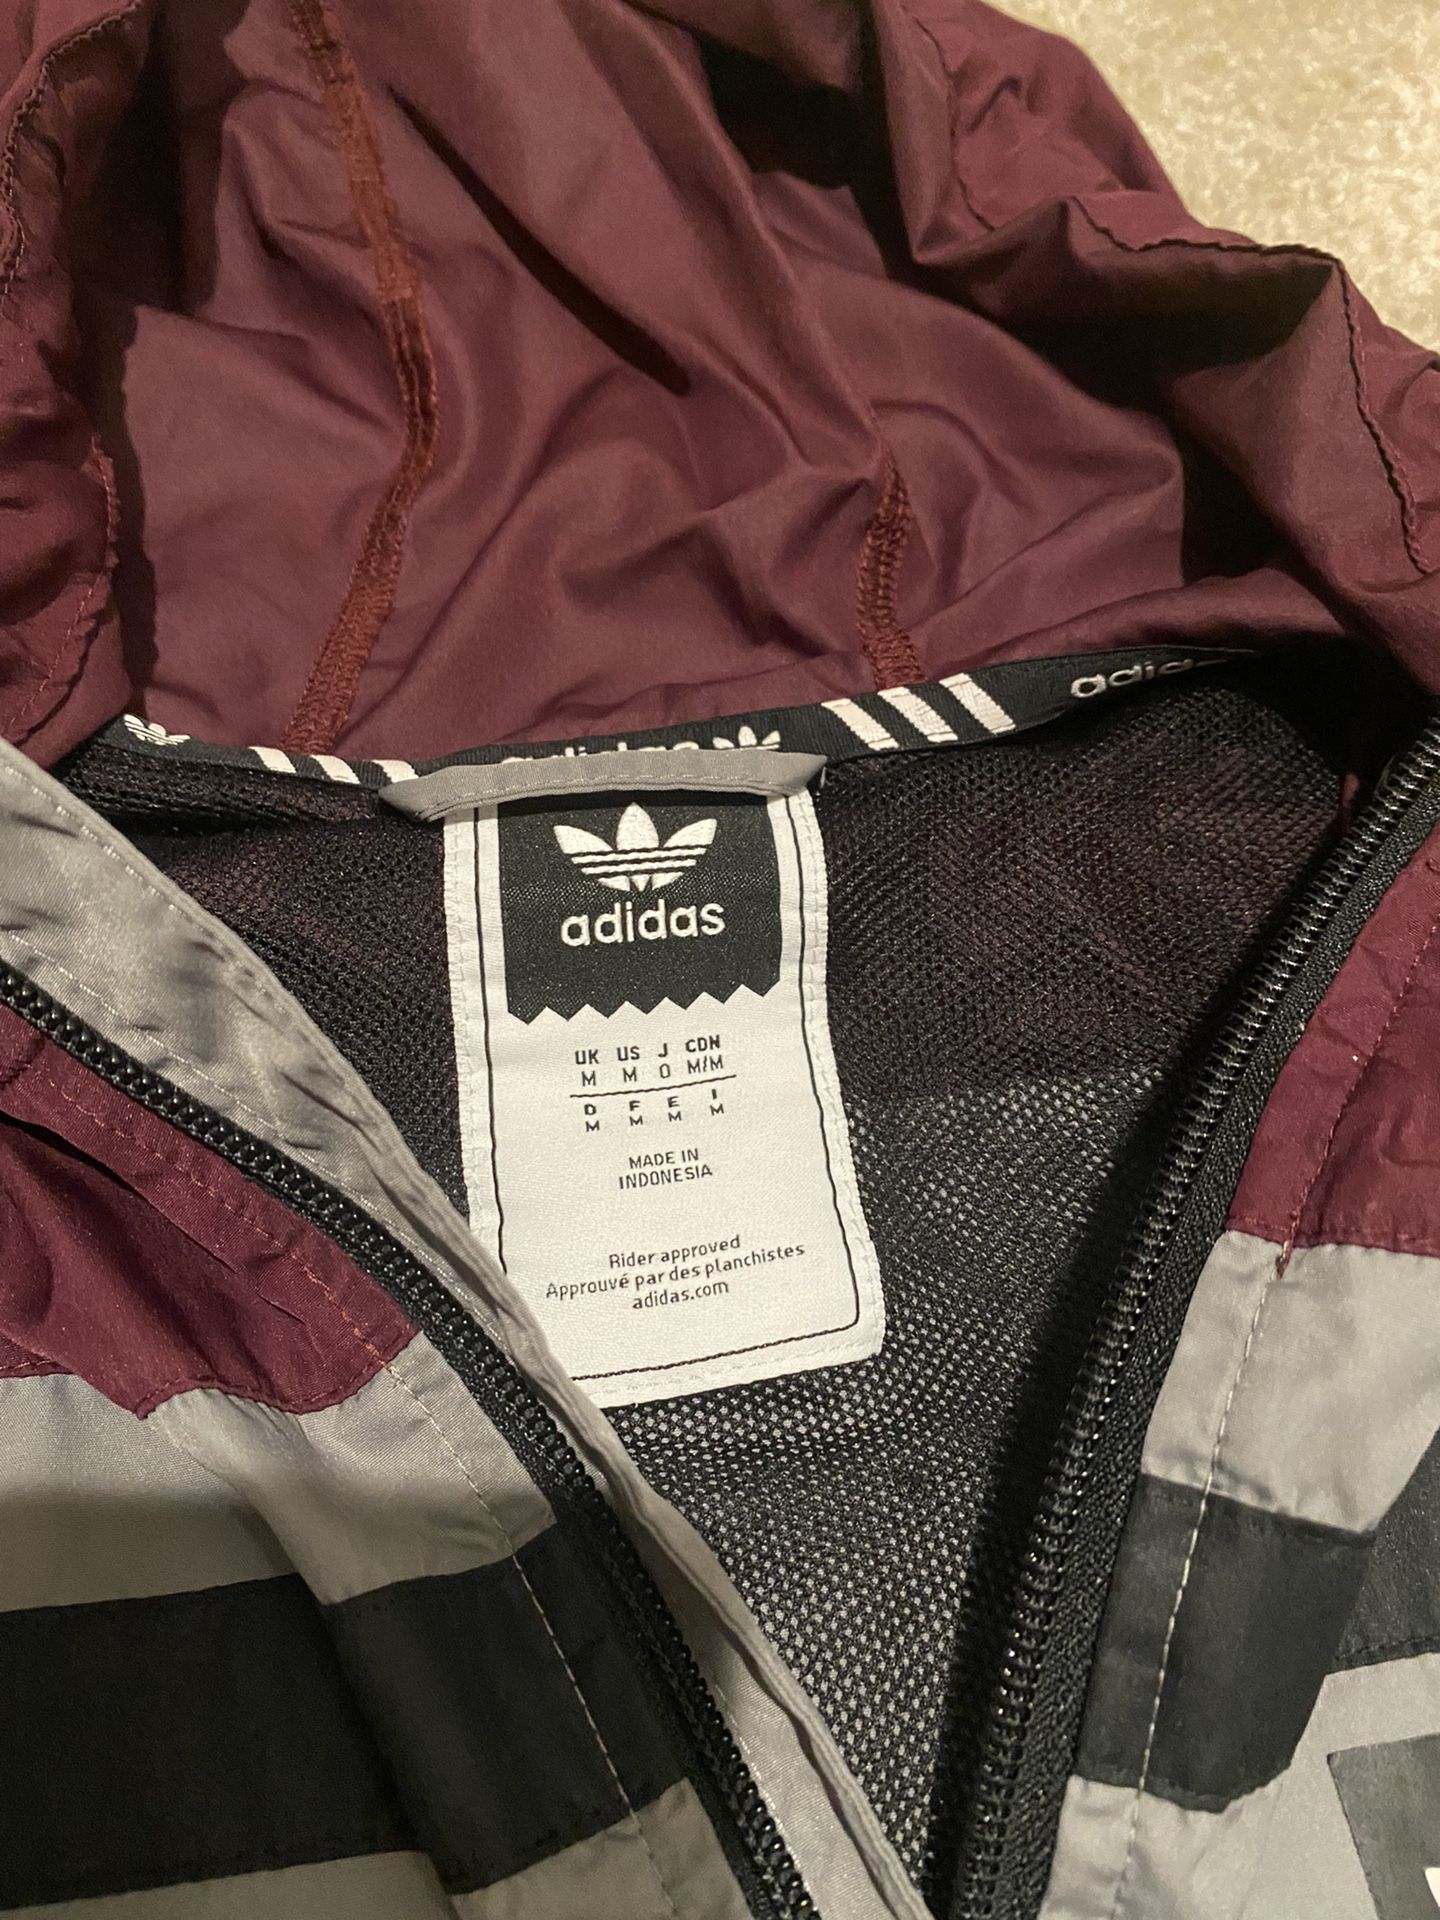 Adidas Grey/Burgundy Windbreaker Hoodie Jacket Size Medium